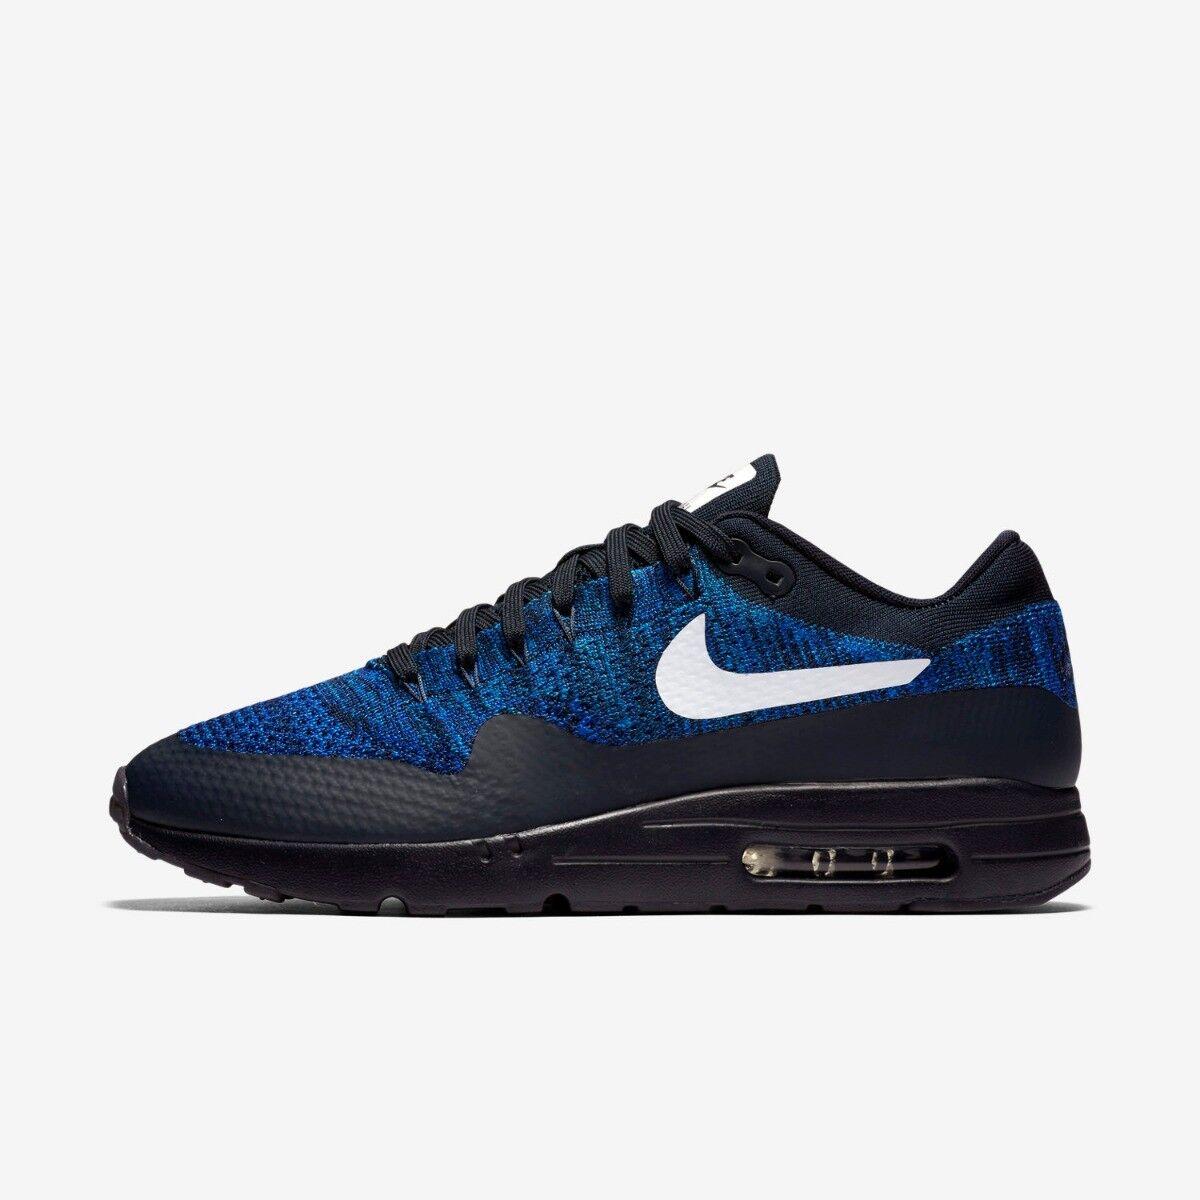 Nike Air Max 1 Ultra Flyknit women fault 5.5 blue black Run Nuevo